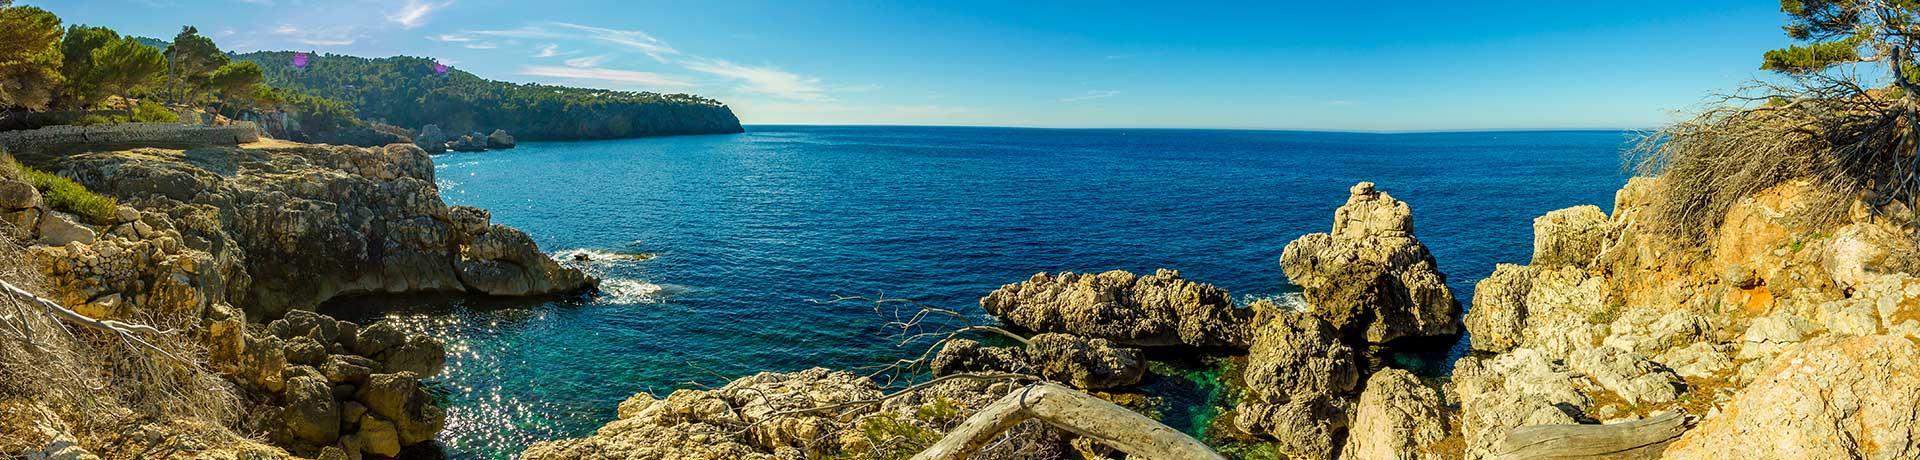 Spanien: Palma de Mallorca - Emotion